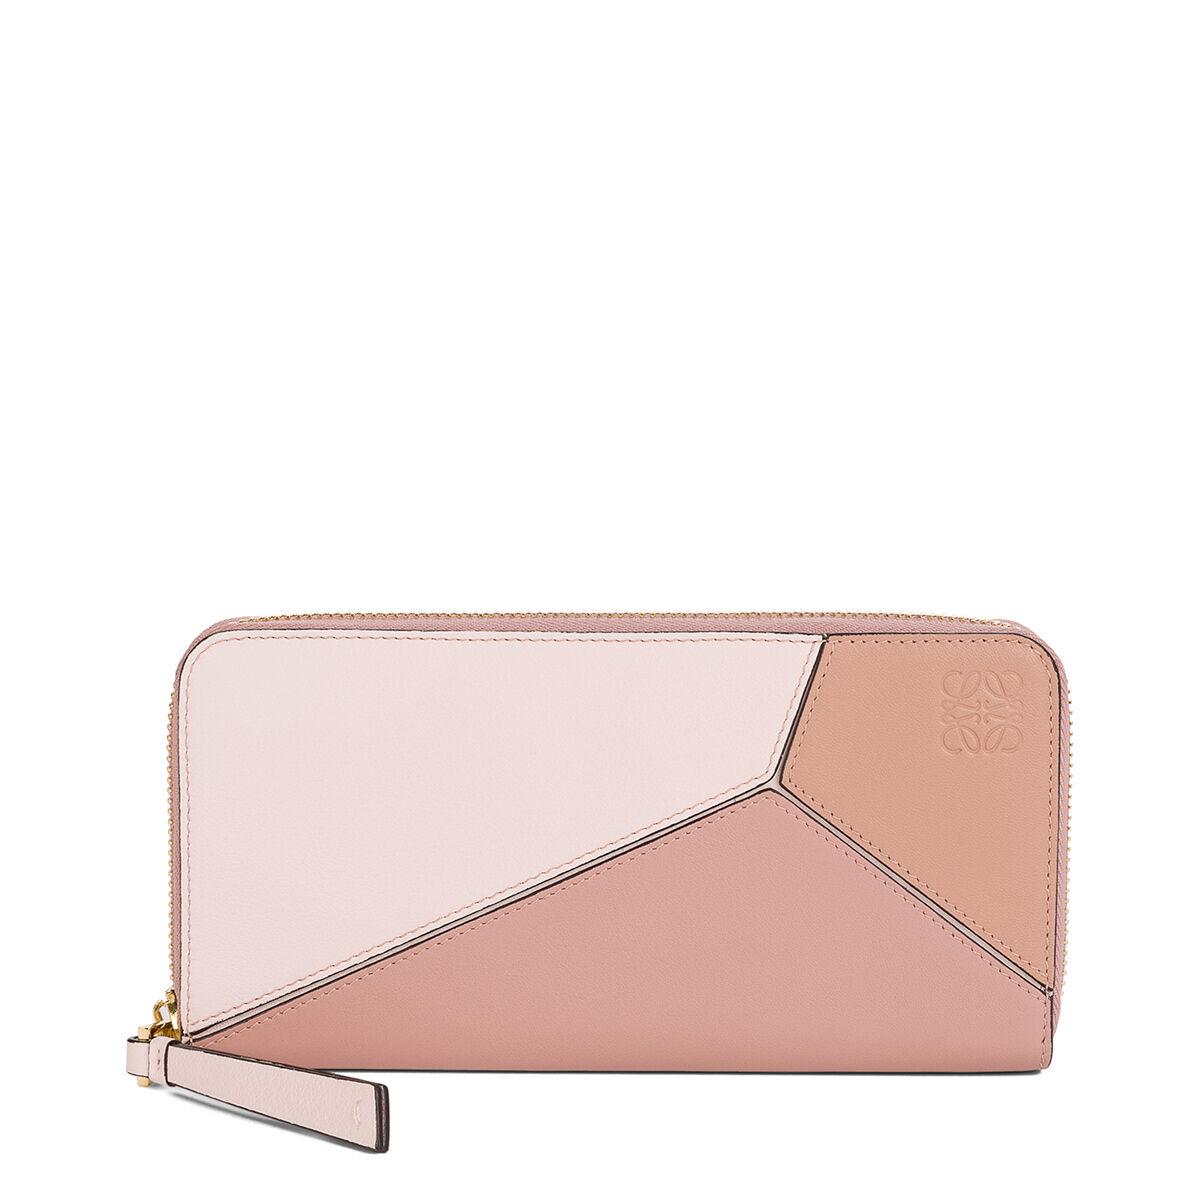 LOEWE Puzzle Zip Around Wallet Blush Multitone all